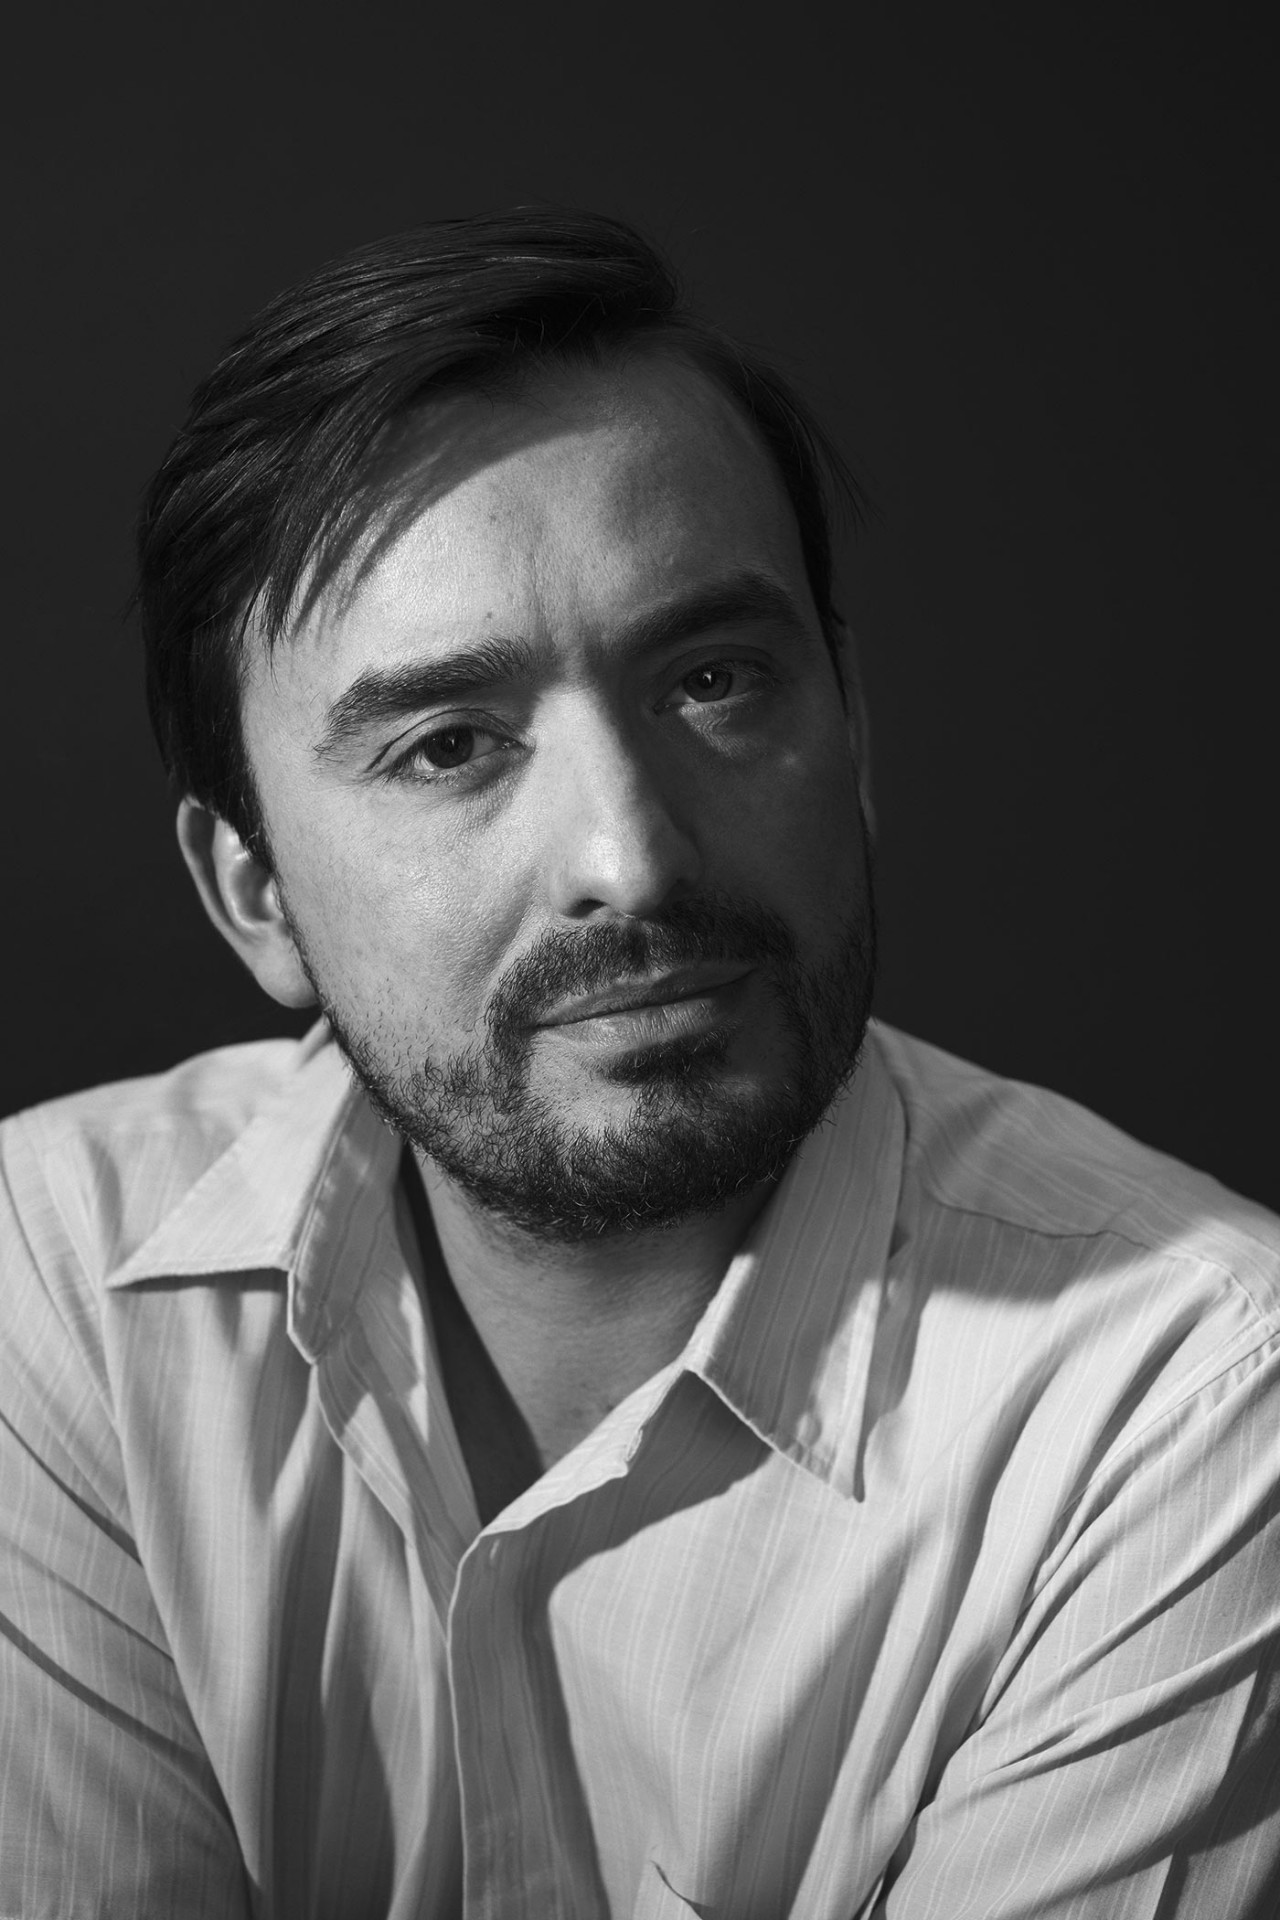 NIKOLAI ZIENER PHOTOGRAPHY Atilla Öner, 2017